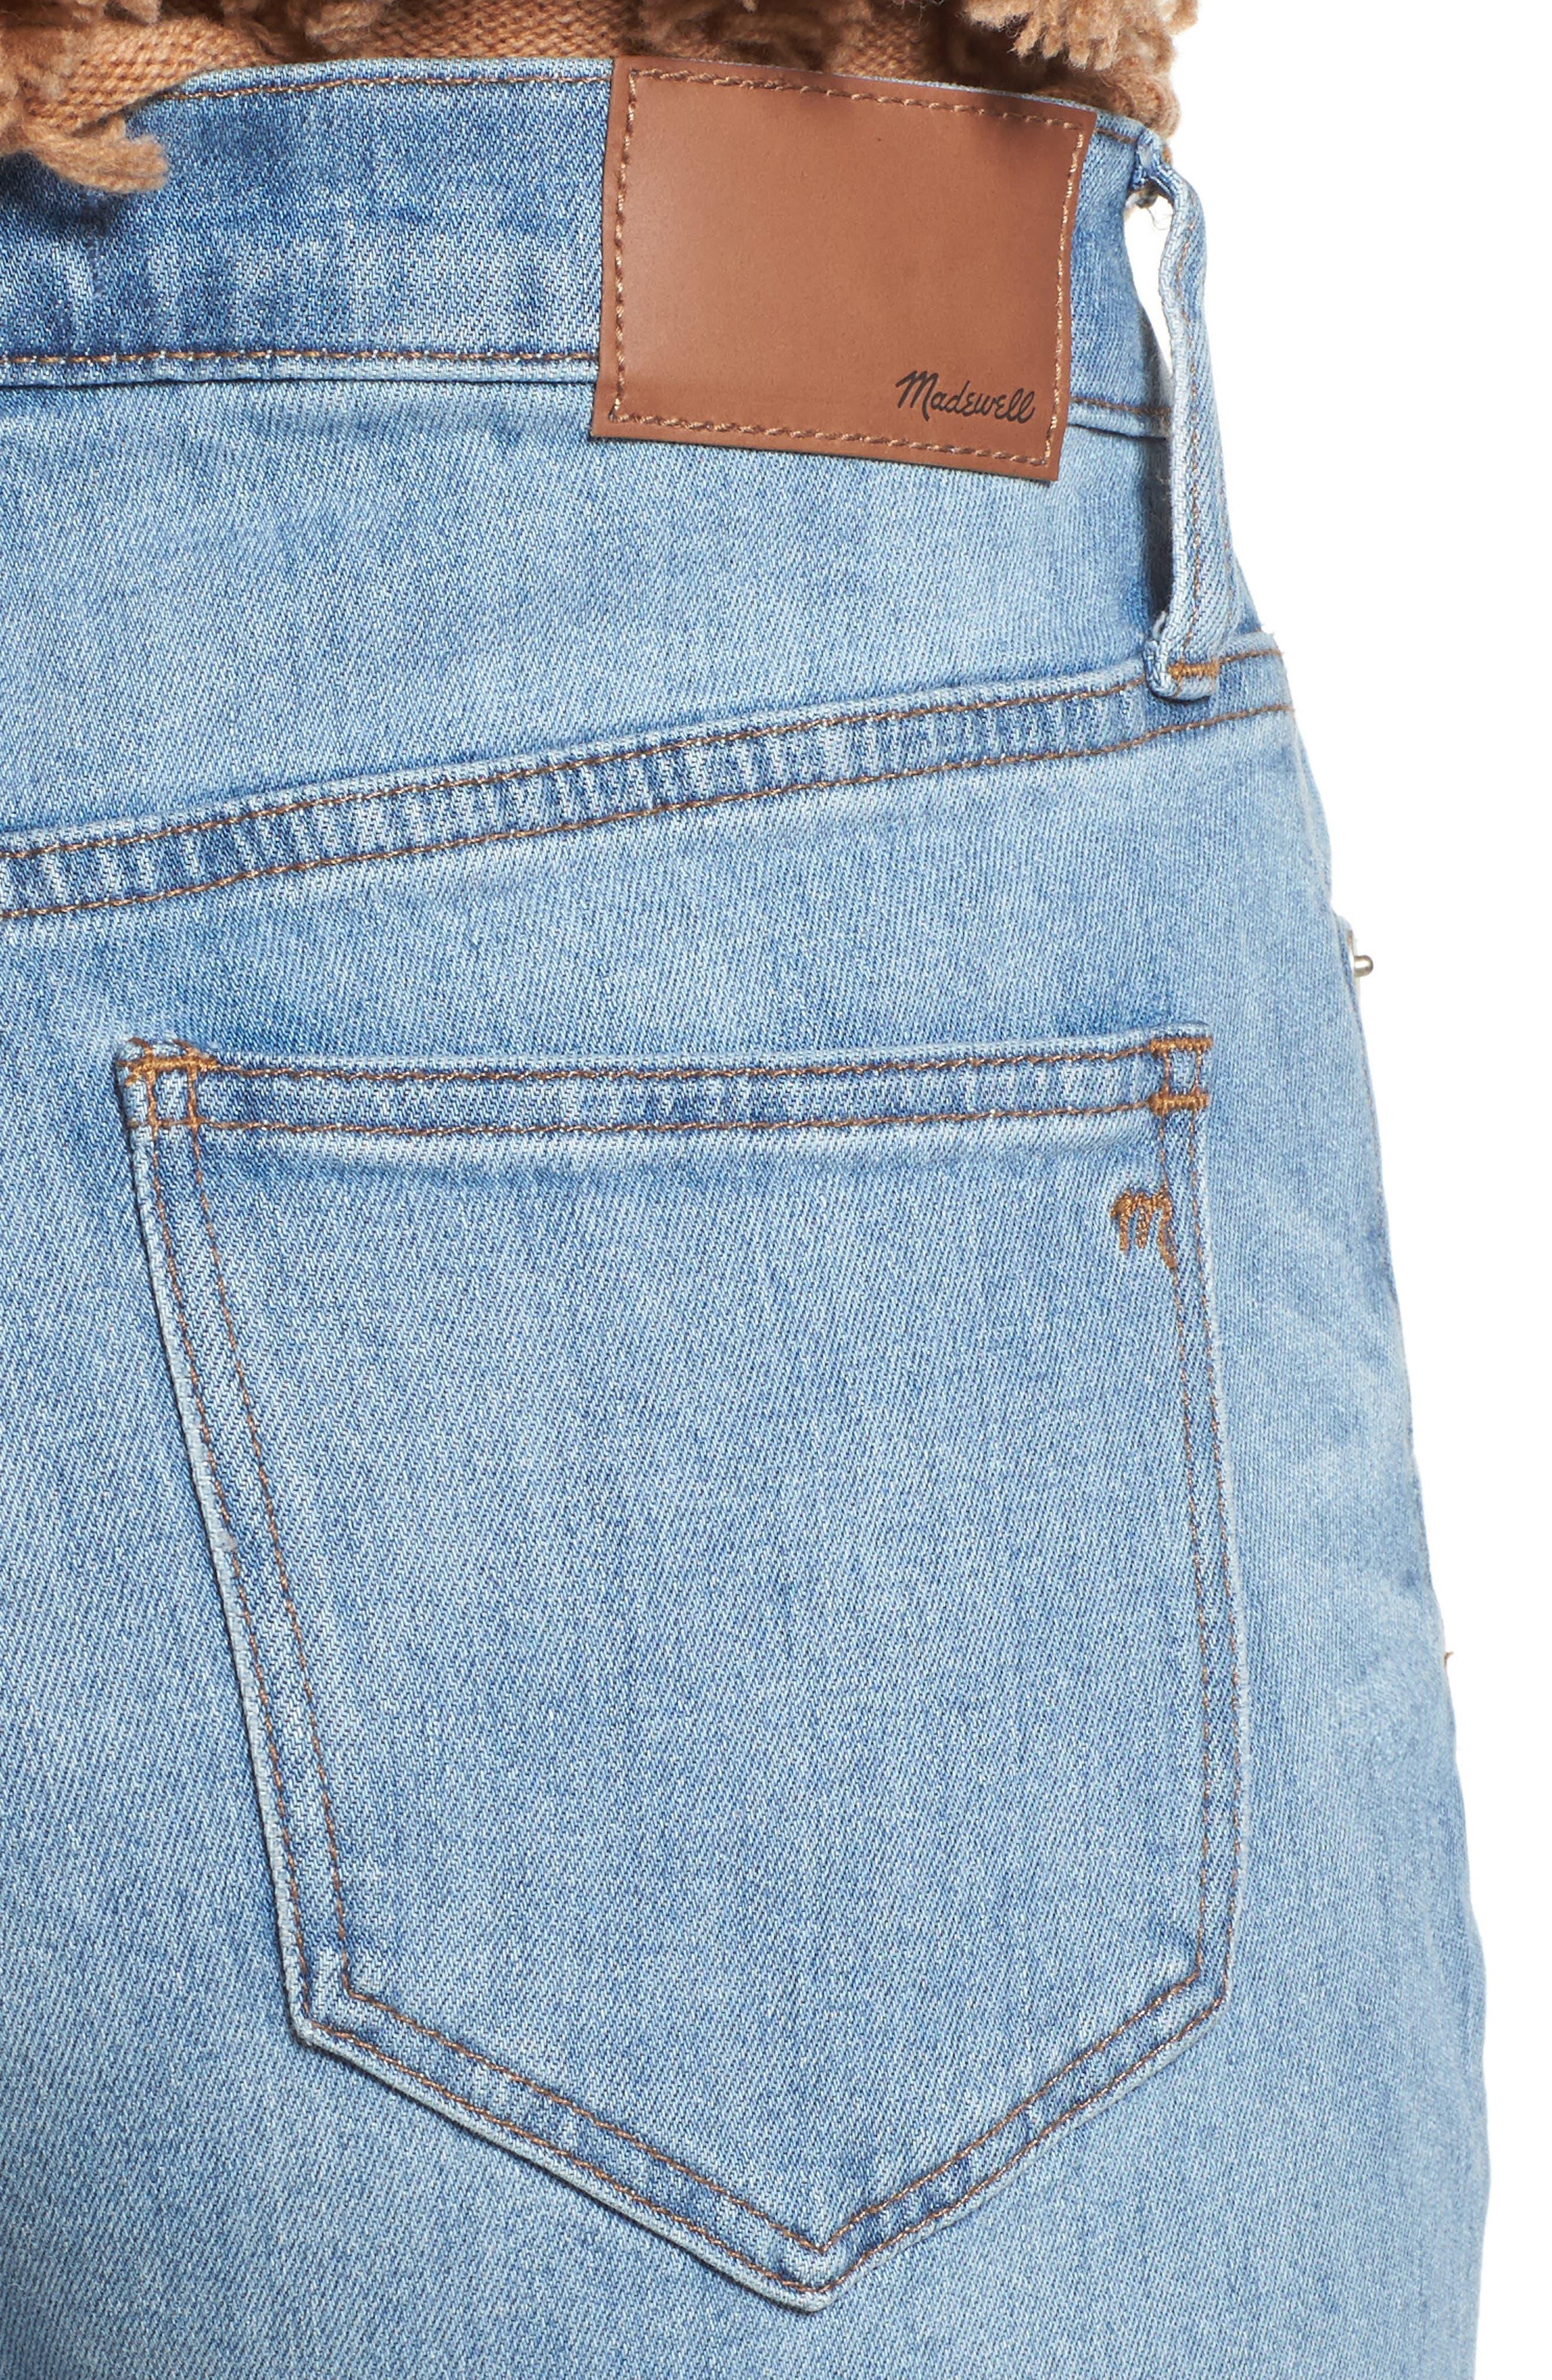 Cruiser Pieced High Waist Straight Leg Jeans,                             Alternate thumbnail 4, color,                             Travis Wash